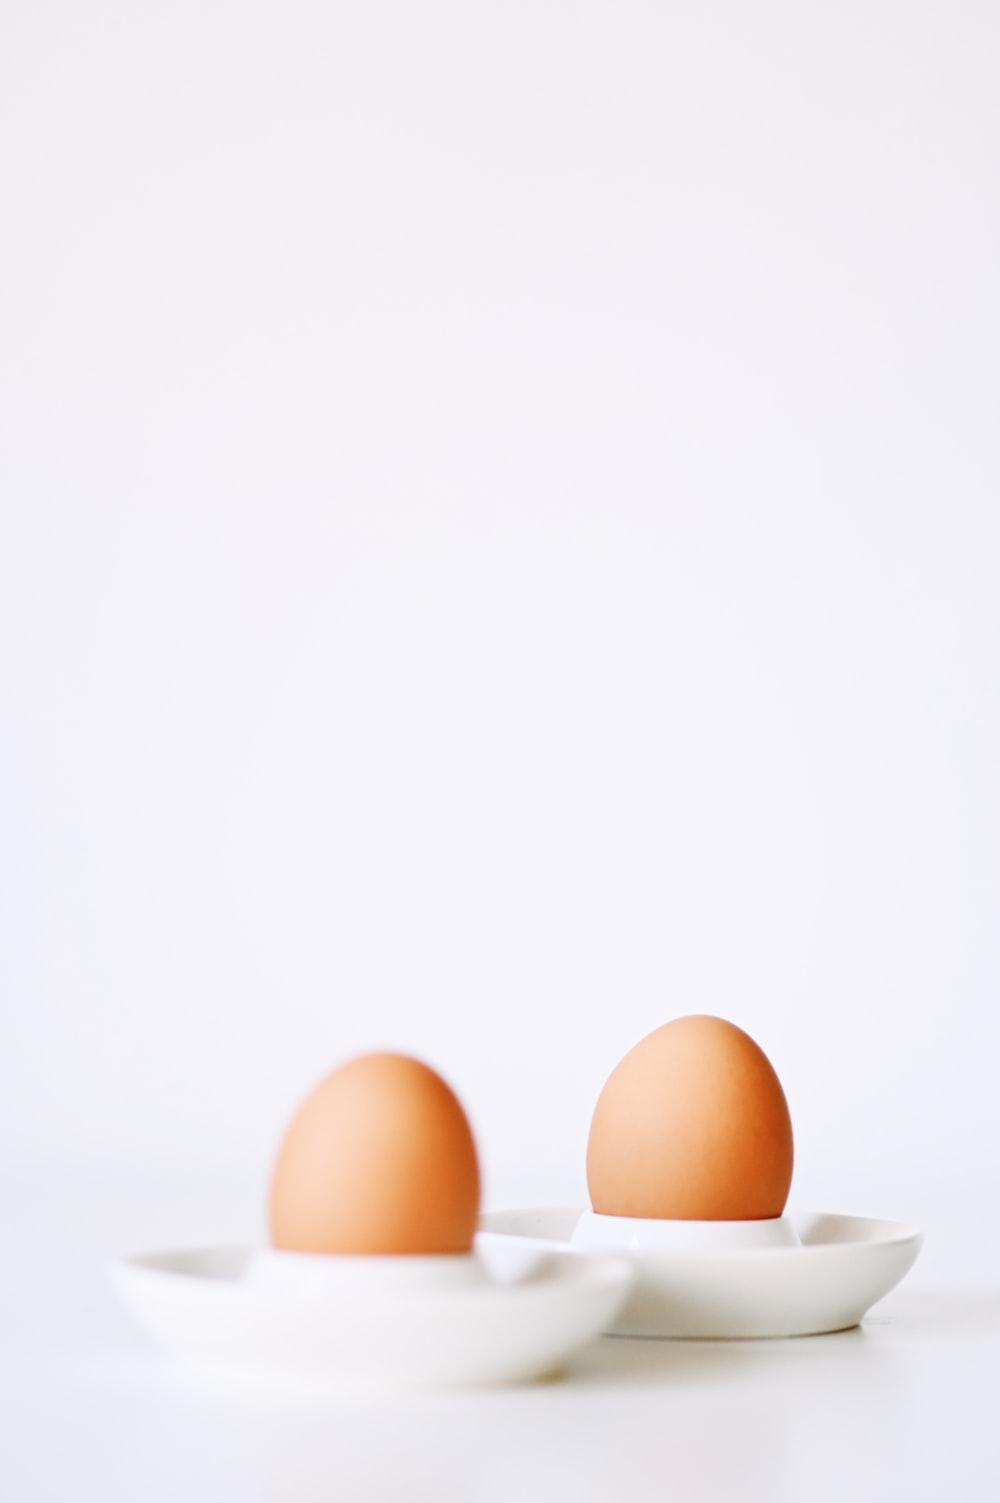 two brown eggshells